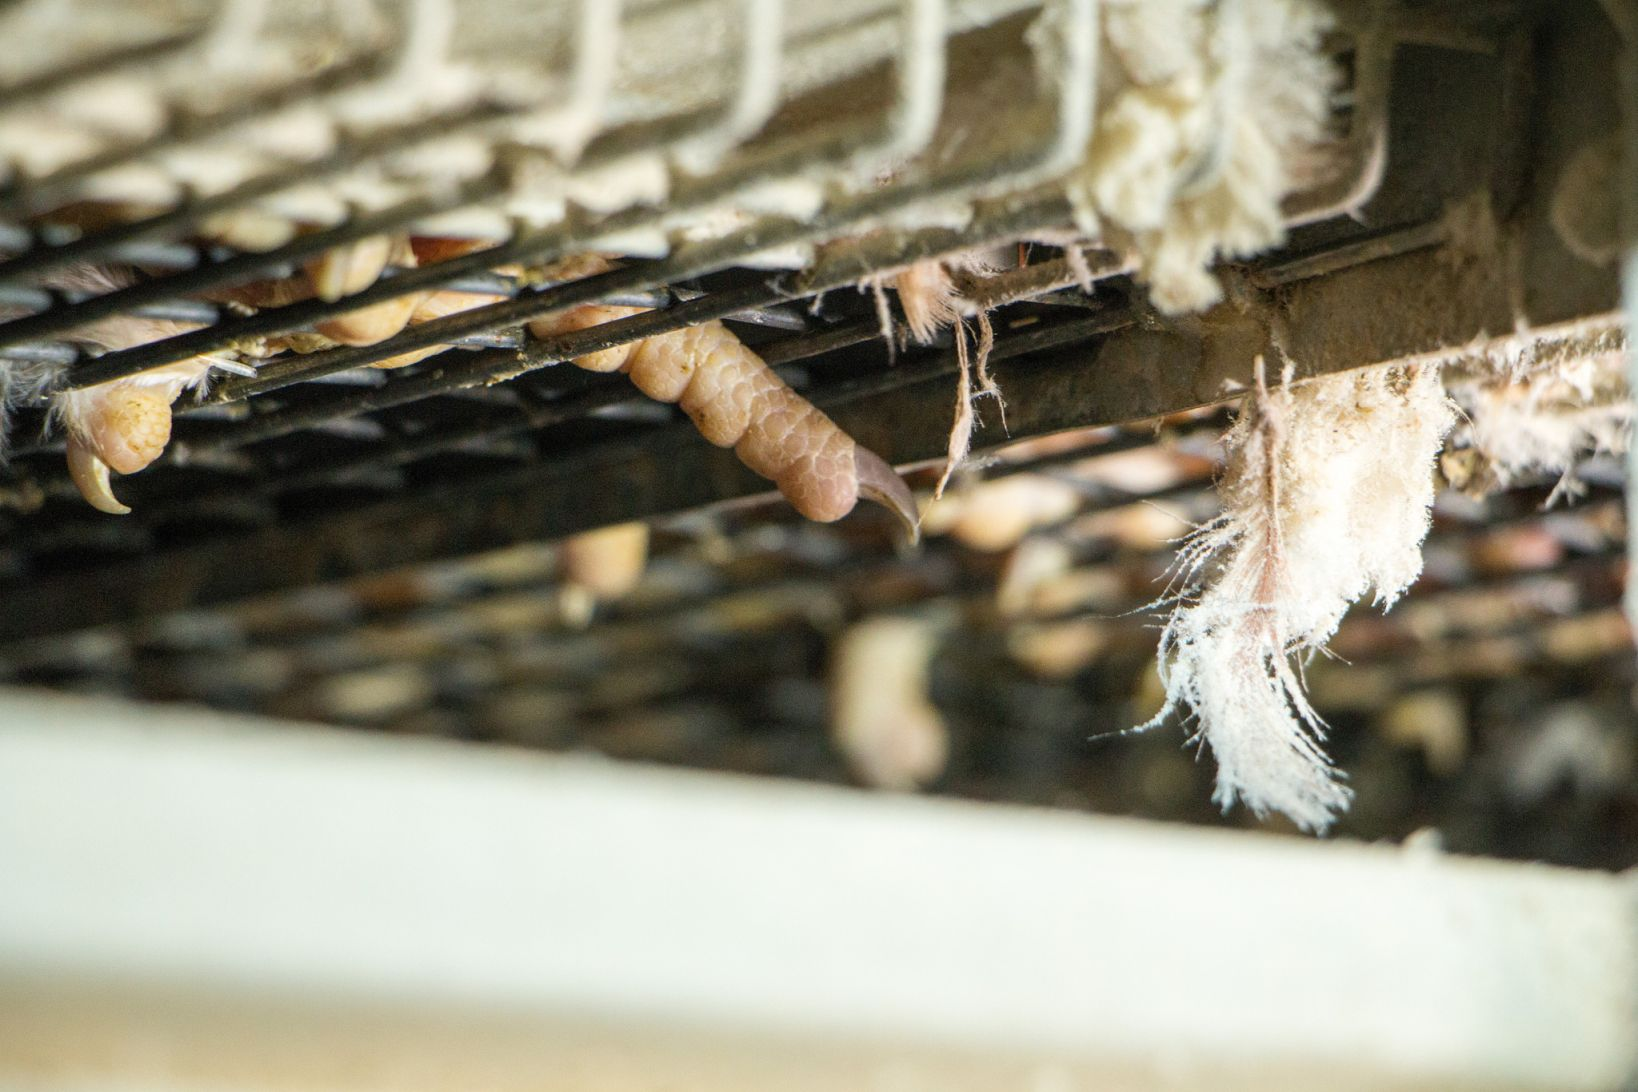 Fermă europeană cu baterii îmbunătățite Foto: Dzīvnieku brīvība